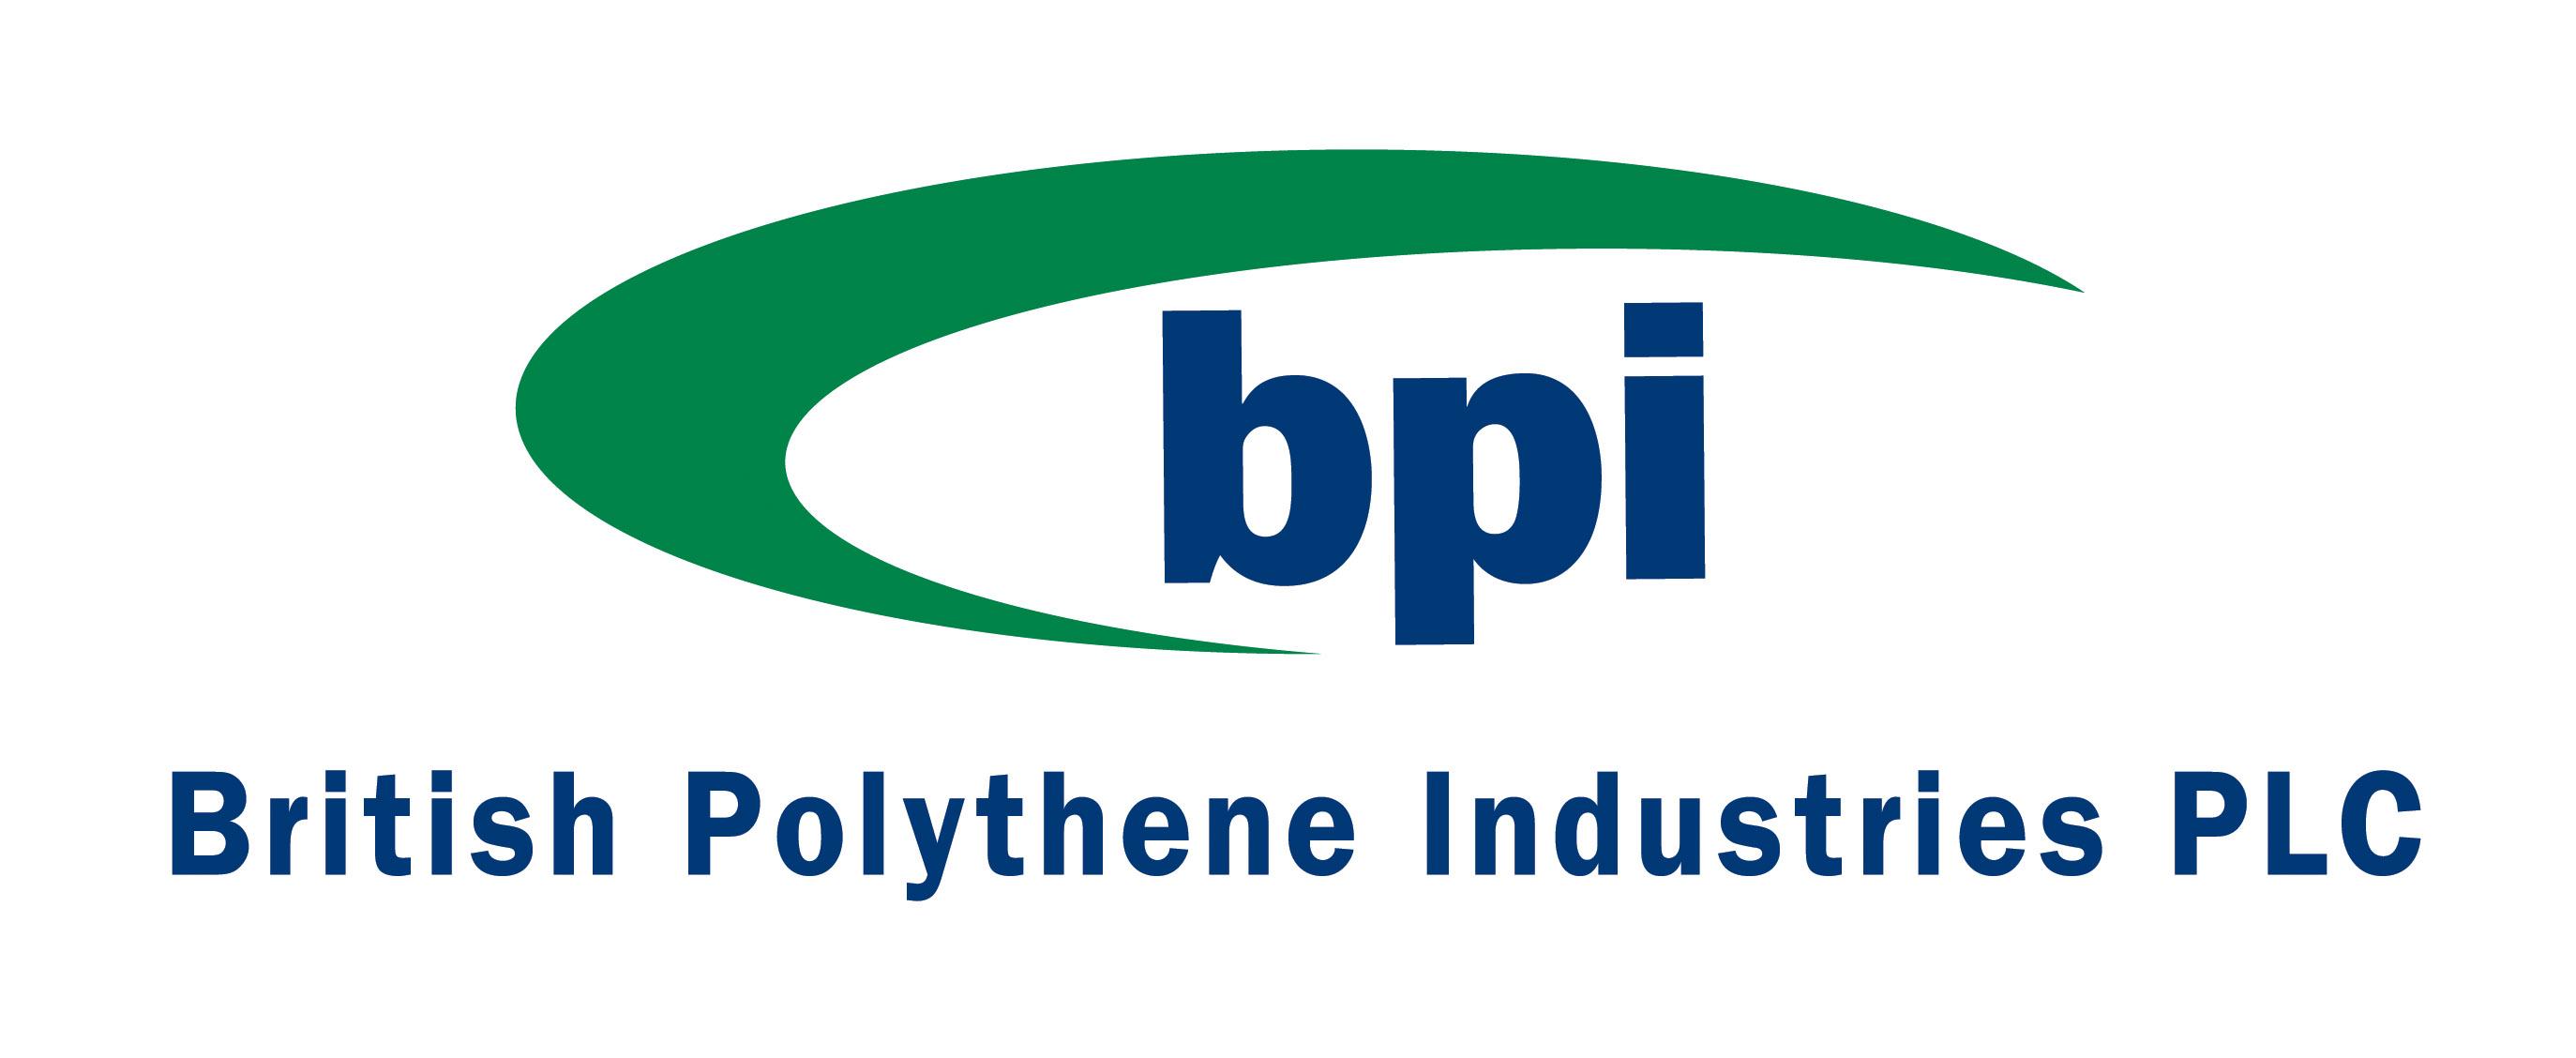 British Polythene Industries plc logo